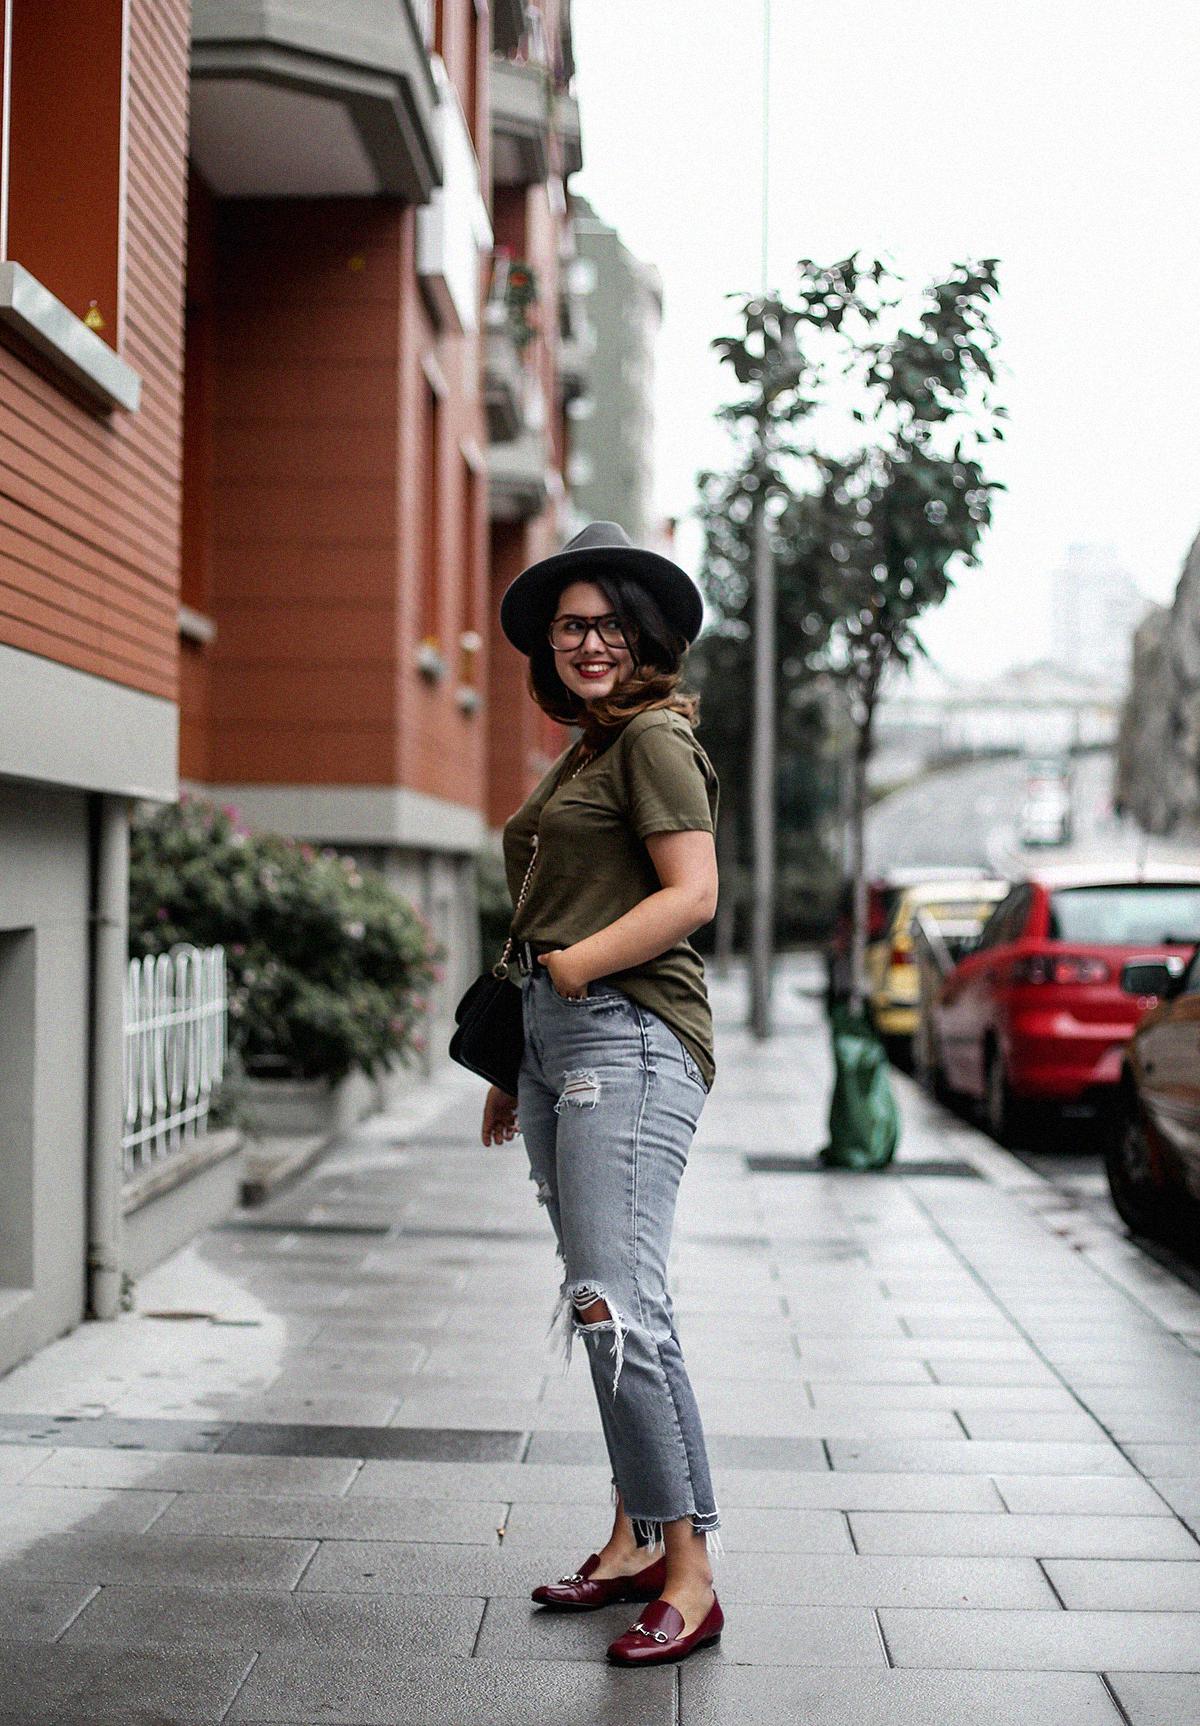 camiseta-verde-militar-basica-look-gucci-horsebit-mocasines-streetstyle9